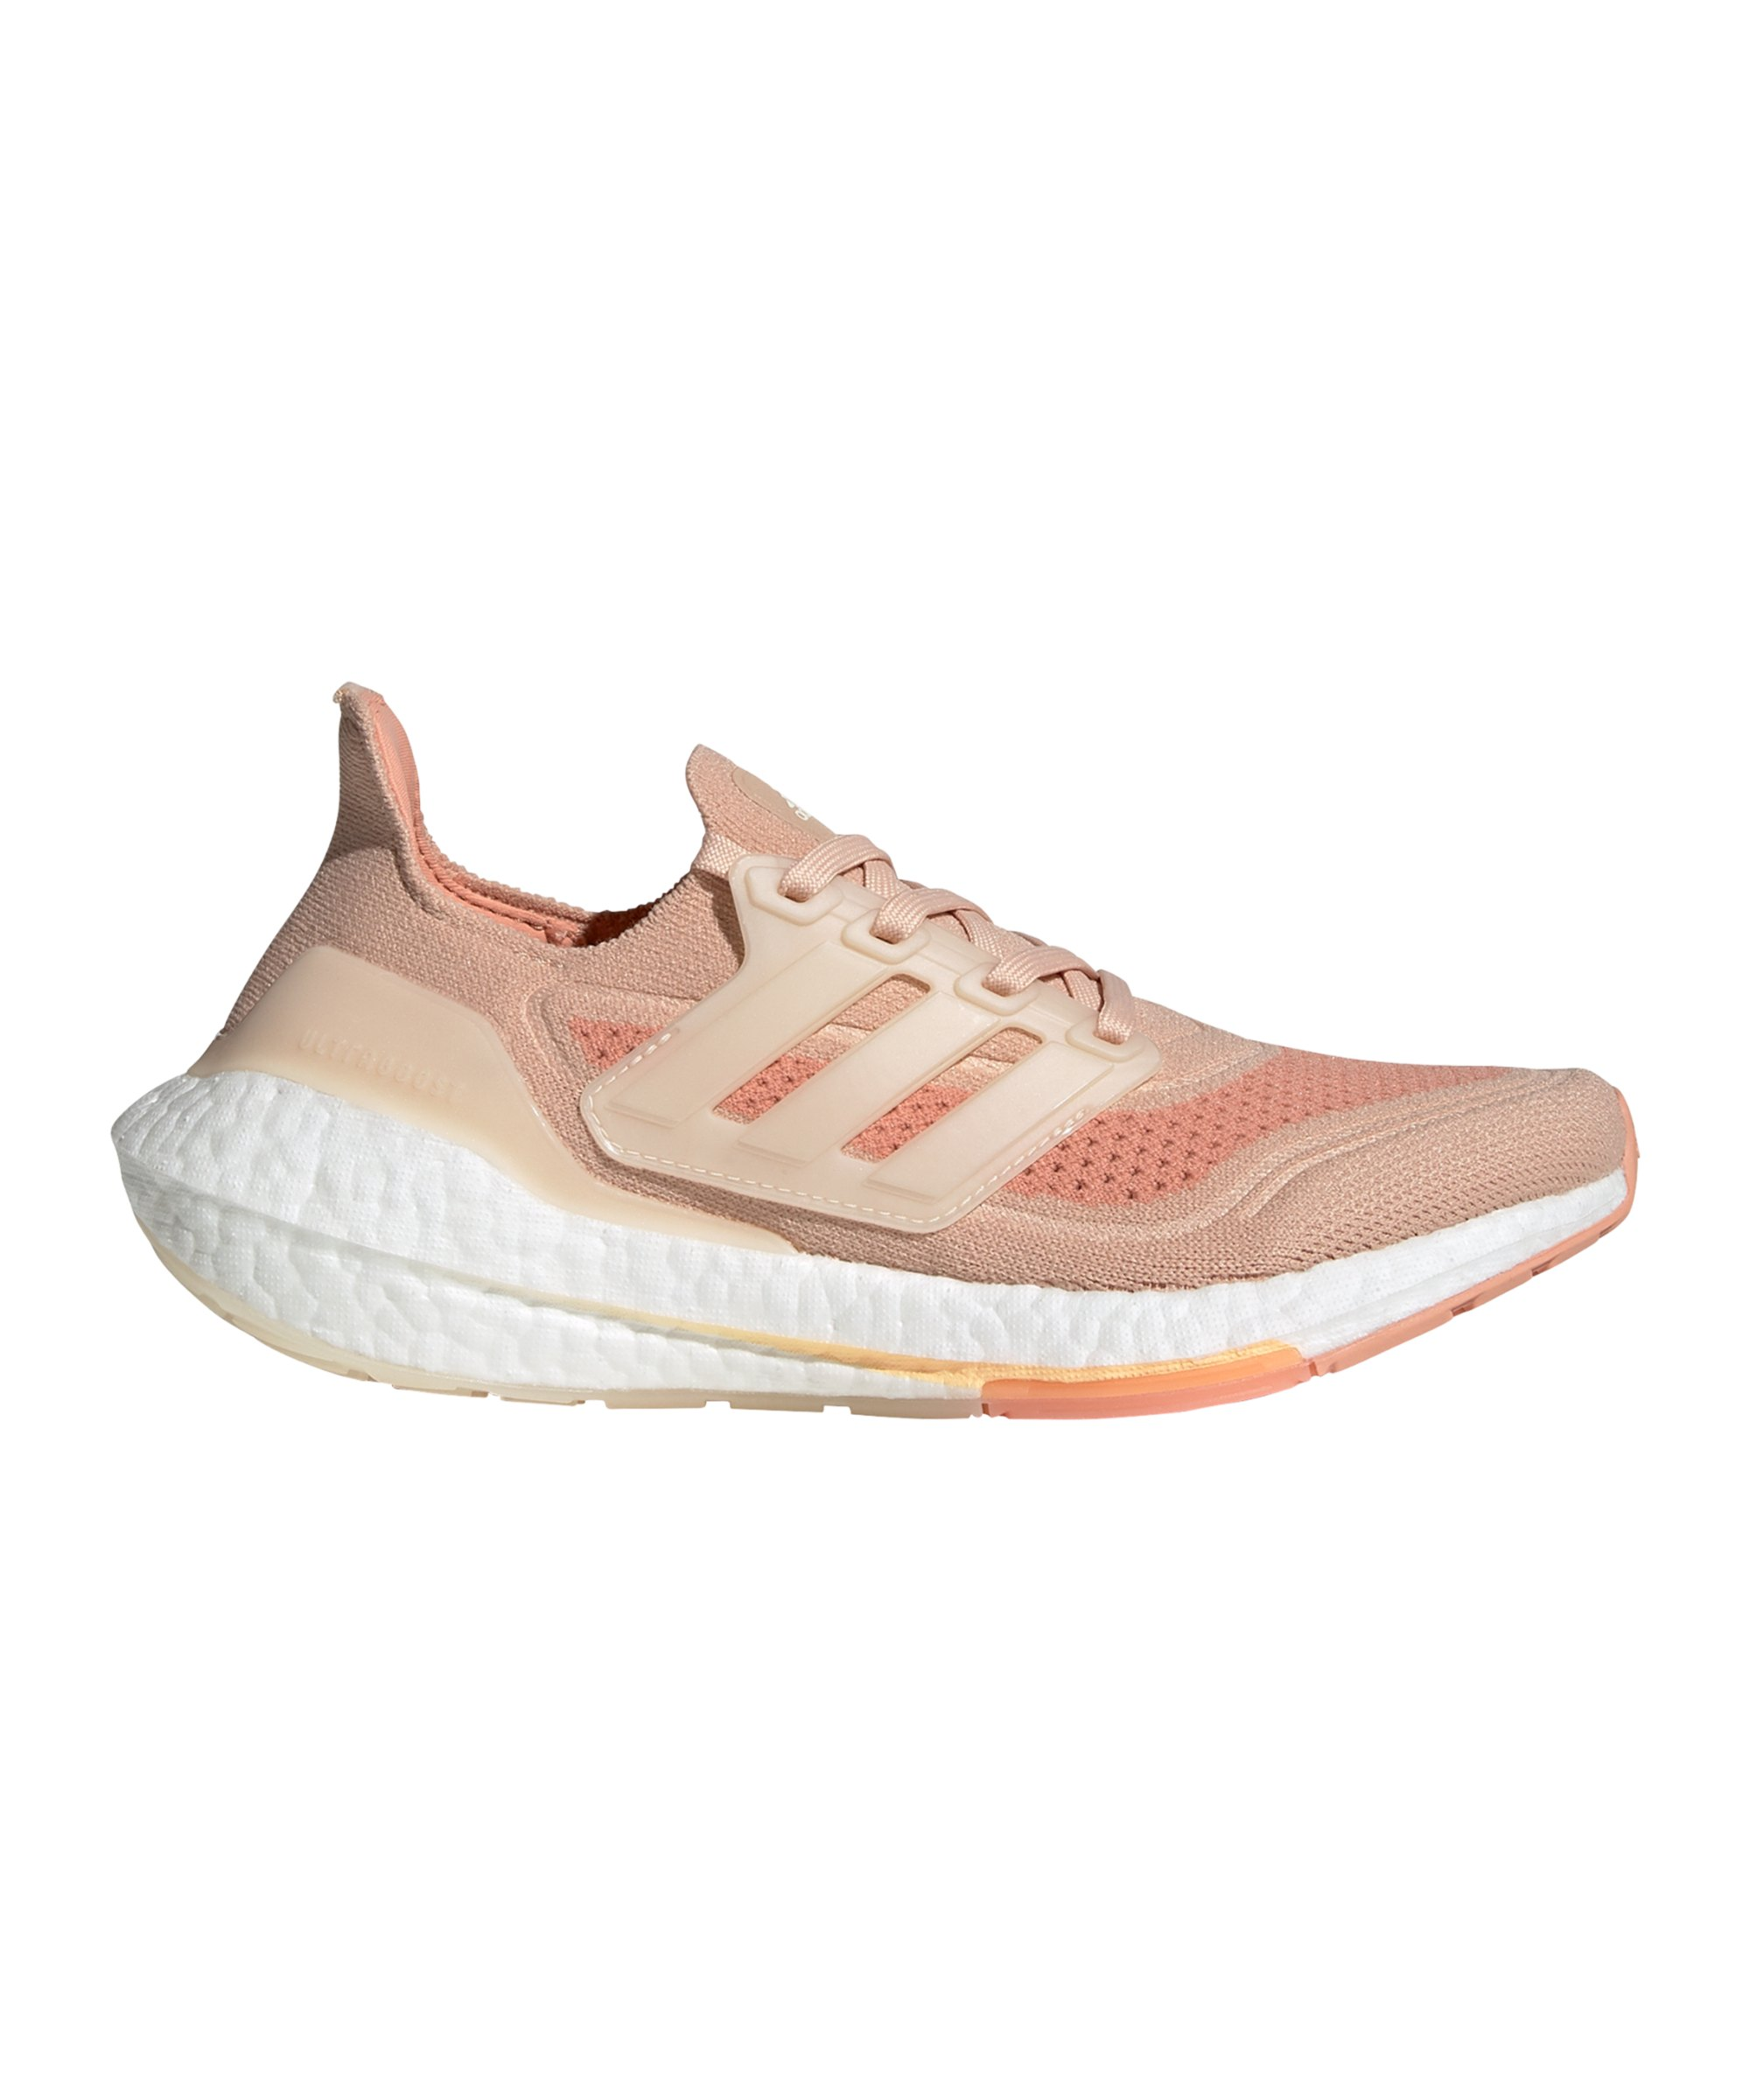 adidas Ultraboost 21 Running Damen Rosa Orange - rosa